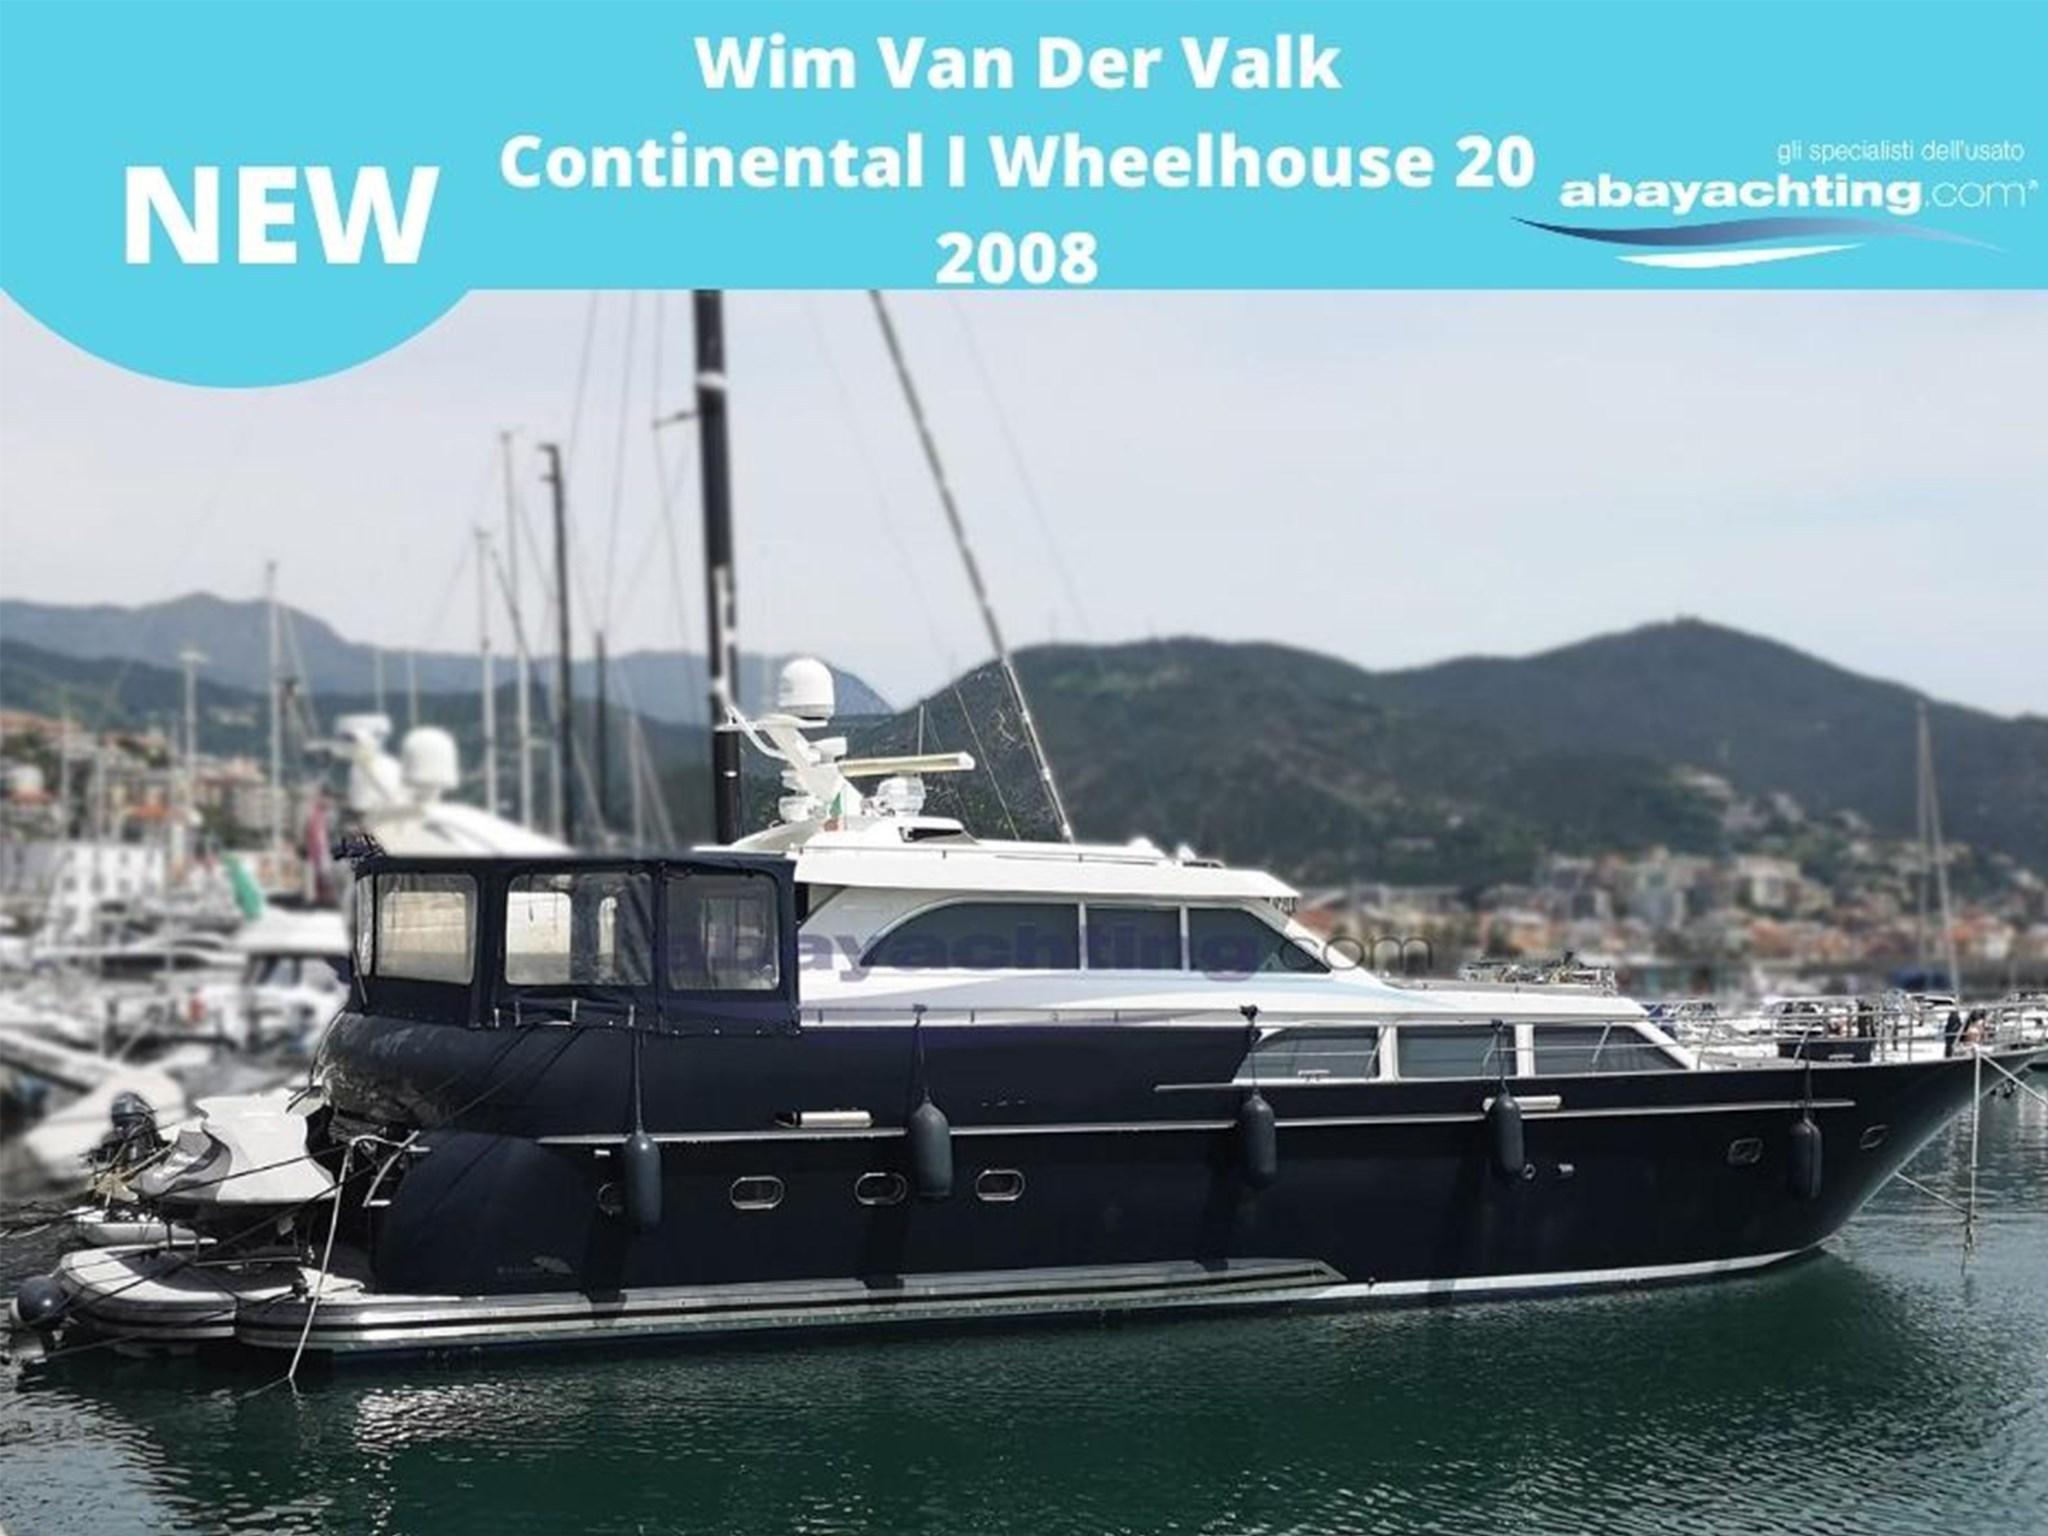 New arrival Wim Van Der Valk Continental I Wheelhouse - 20.00